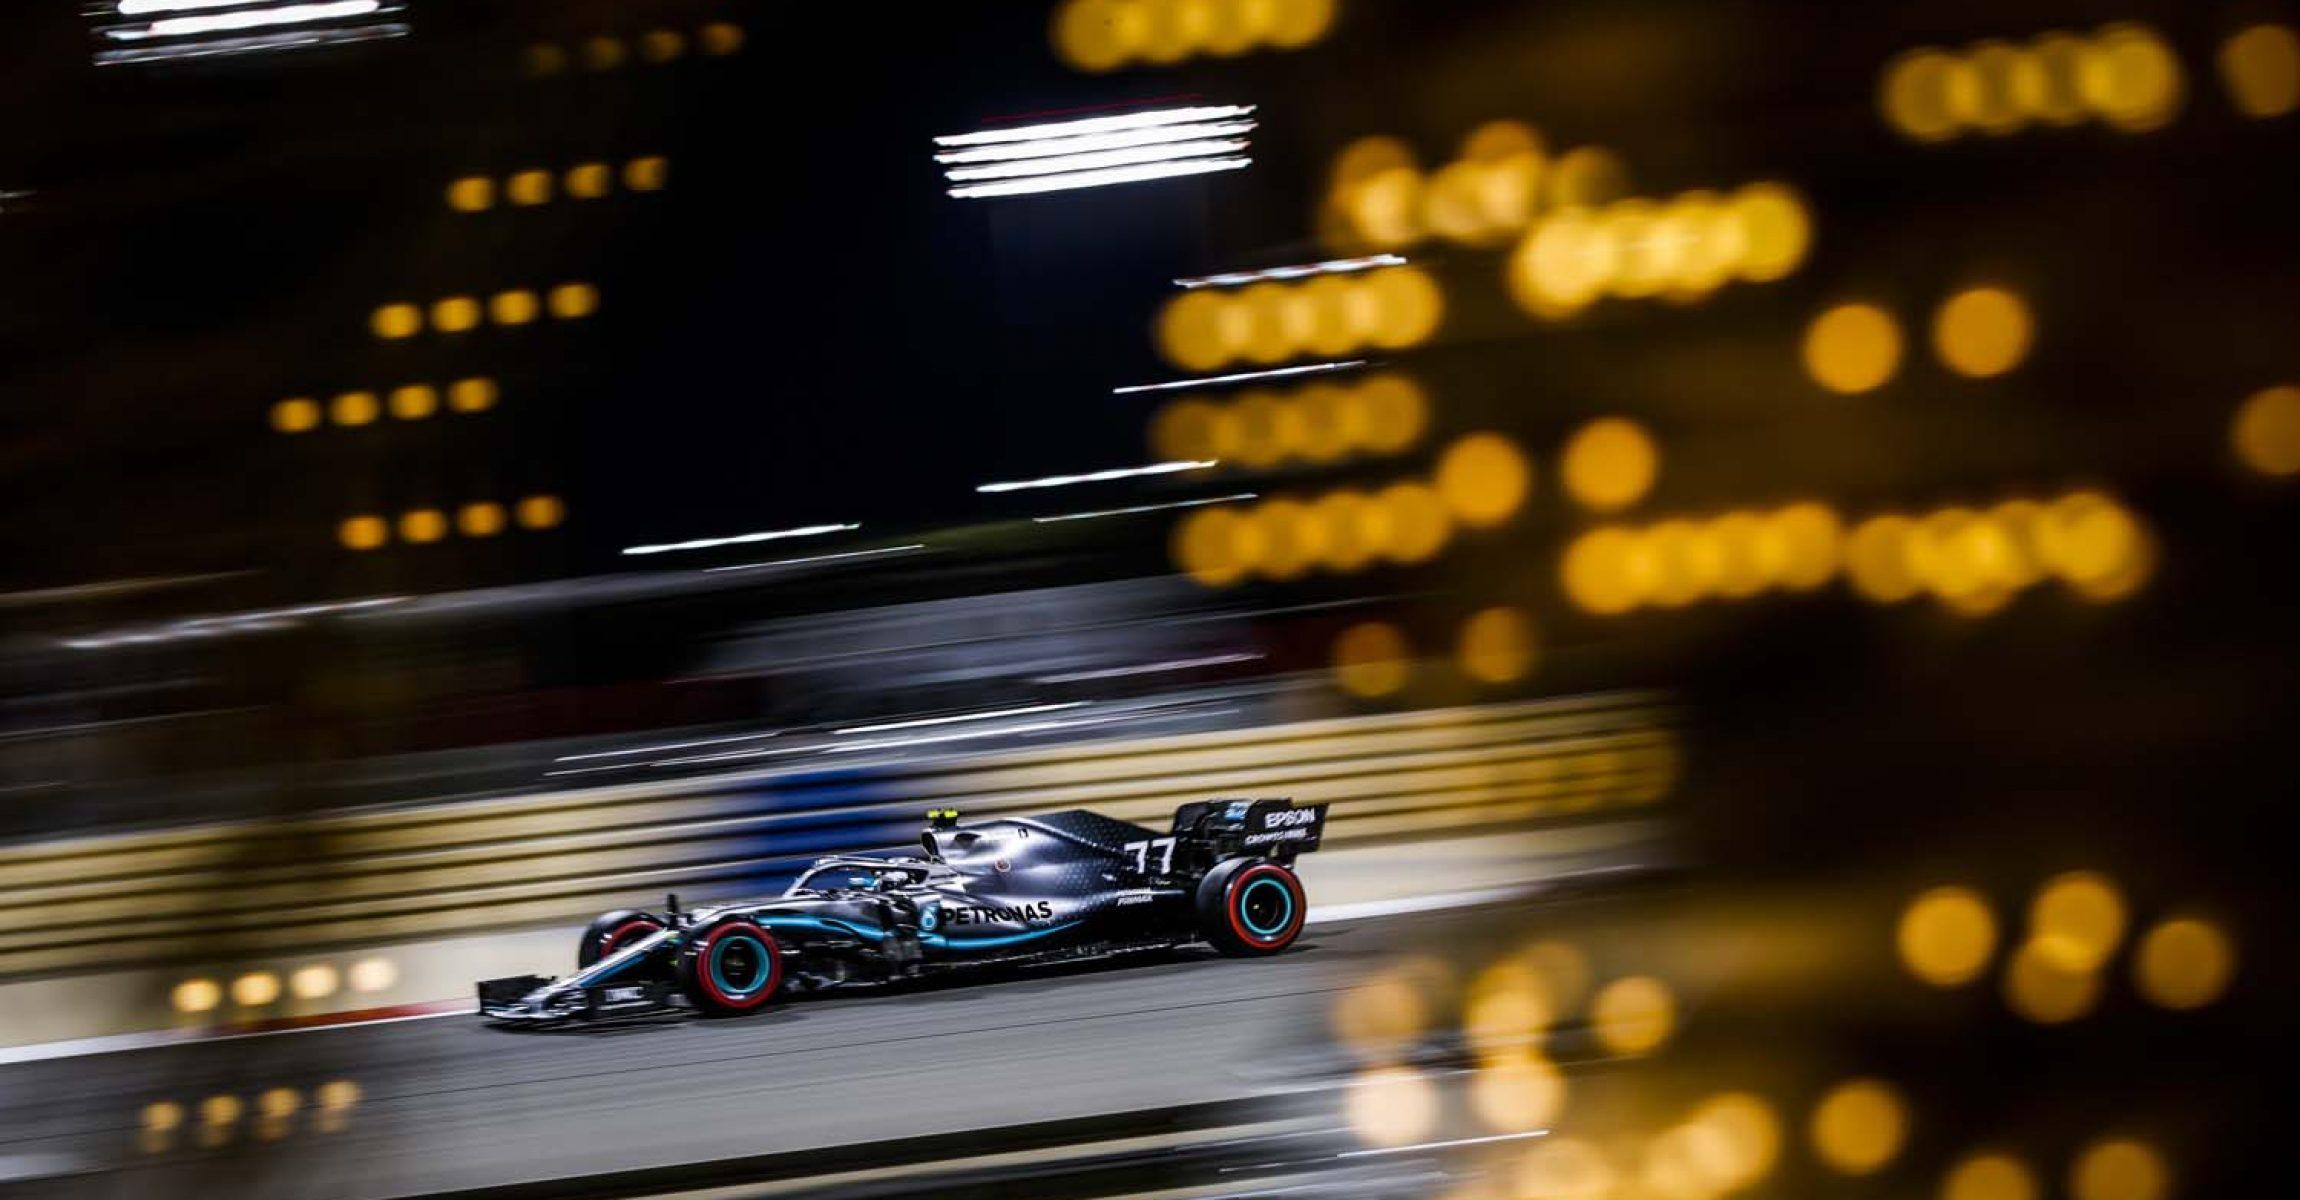 2019 Bahrain Grand Prix, Saturday - Wolfgang Wilhelm Valtteri Bottas Mercedes